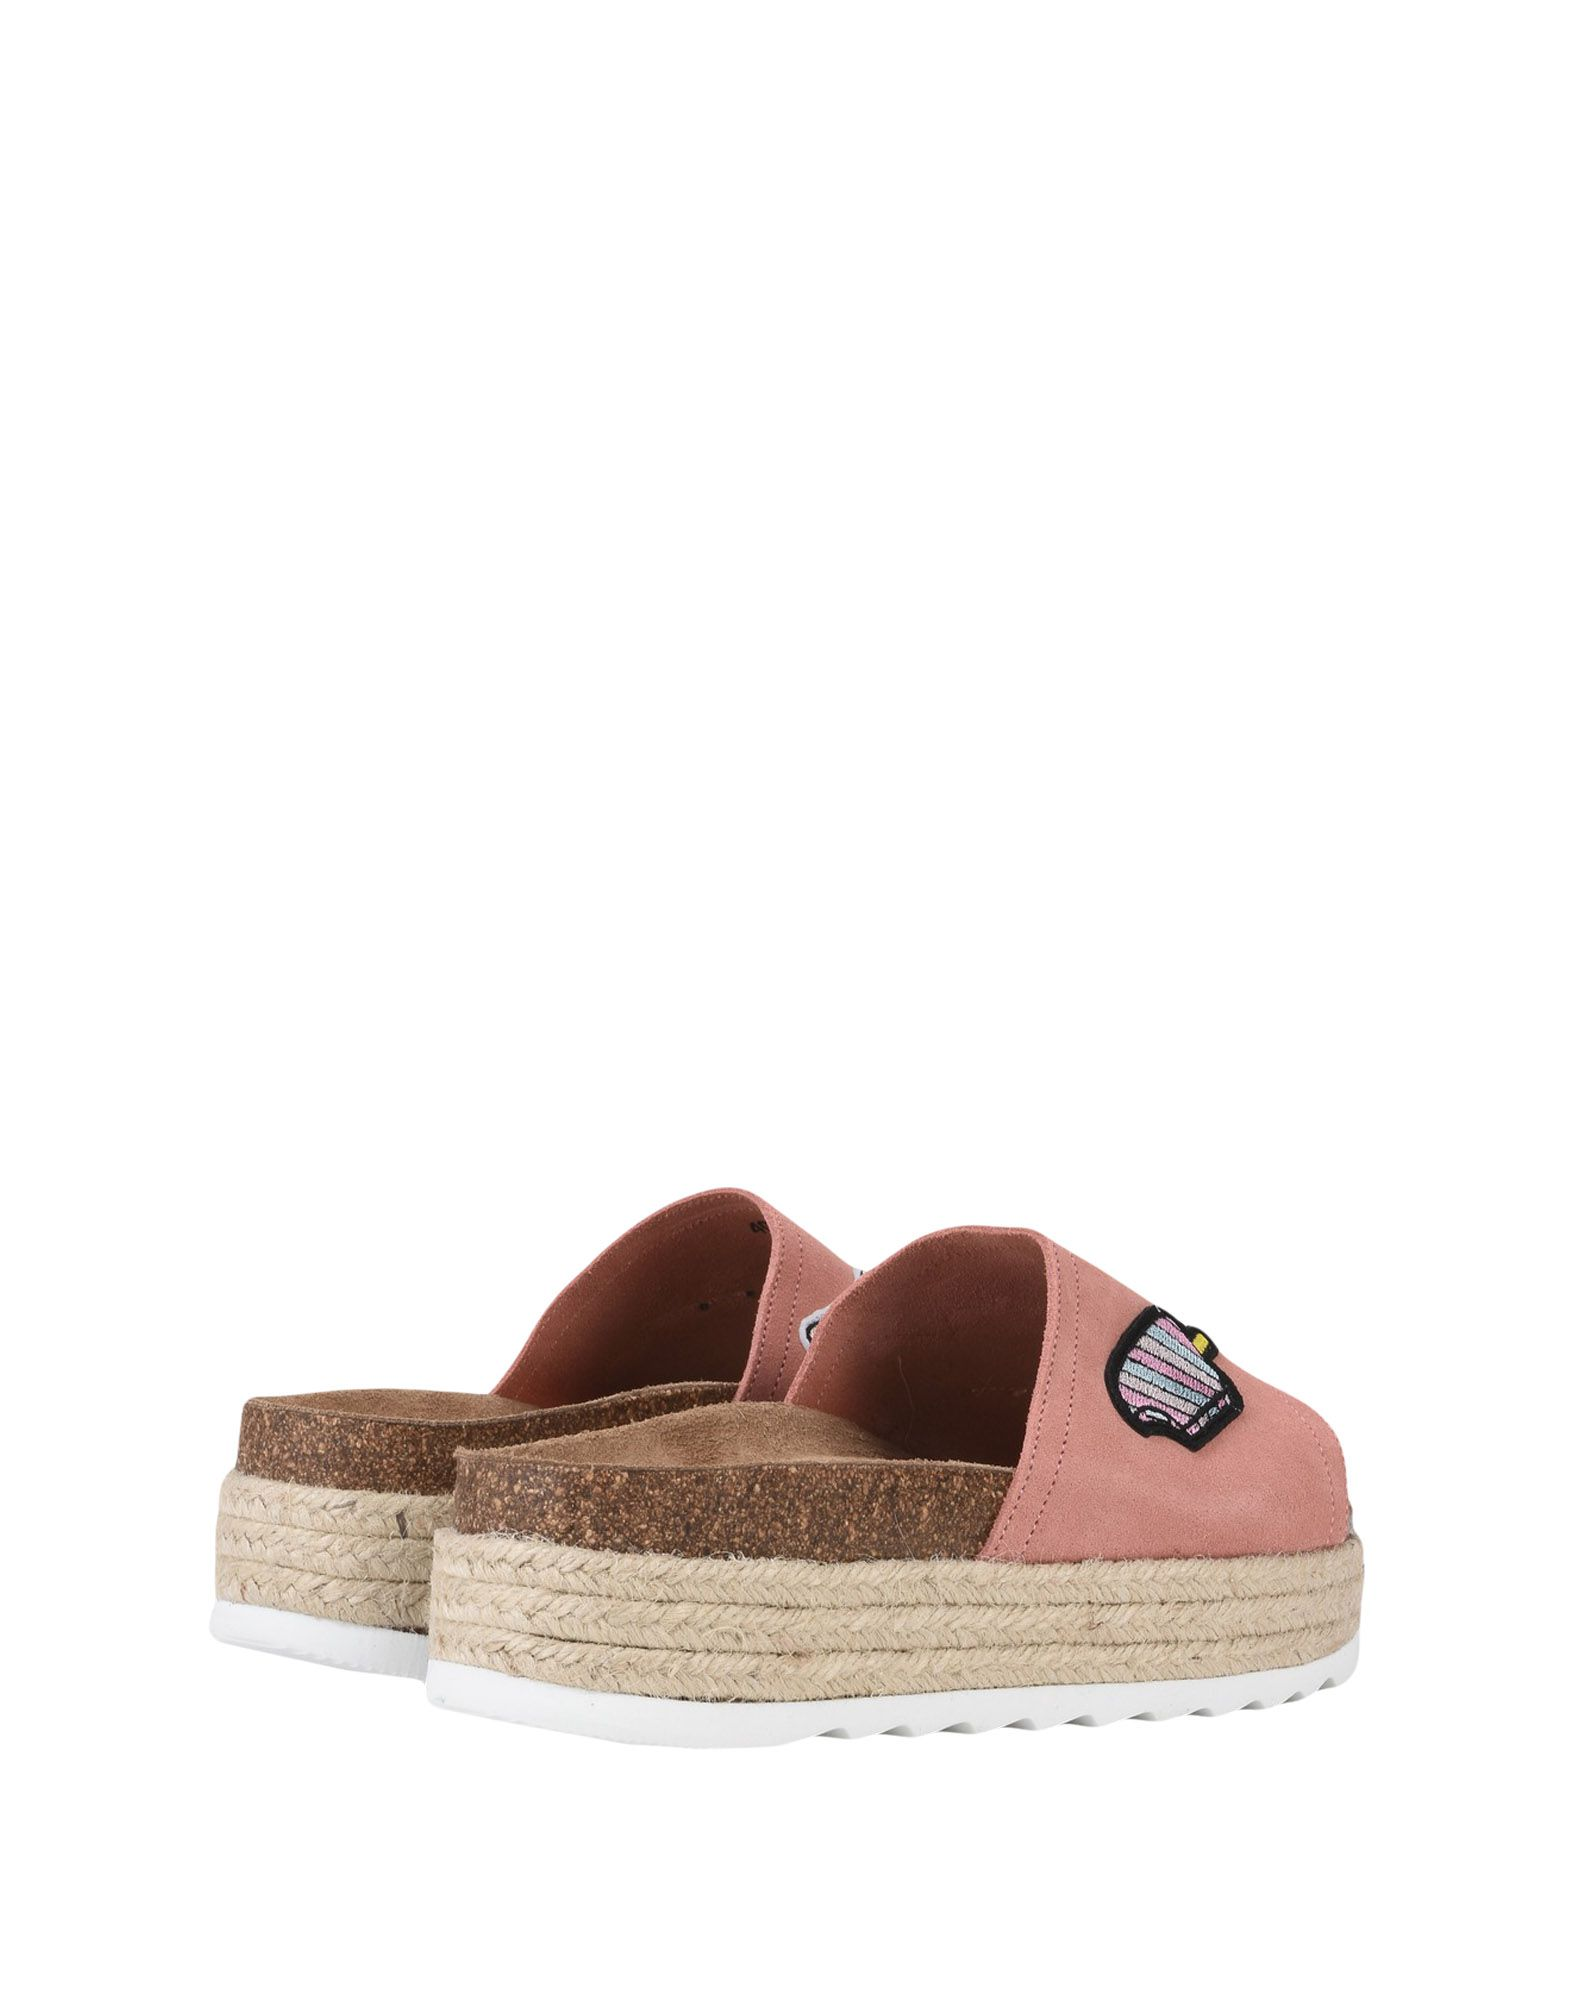 Chaussures - Tribunaux Maison Shoeshibar C4bxq